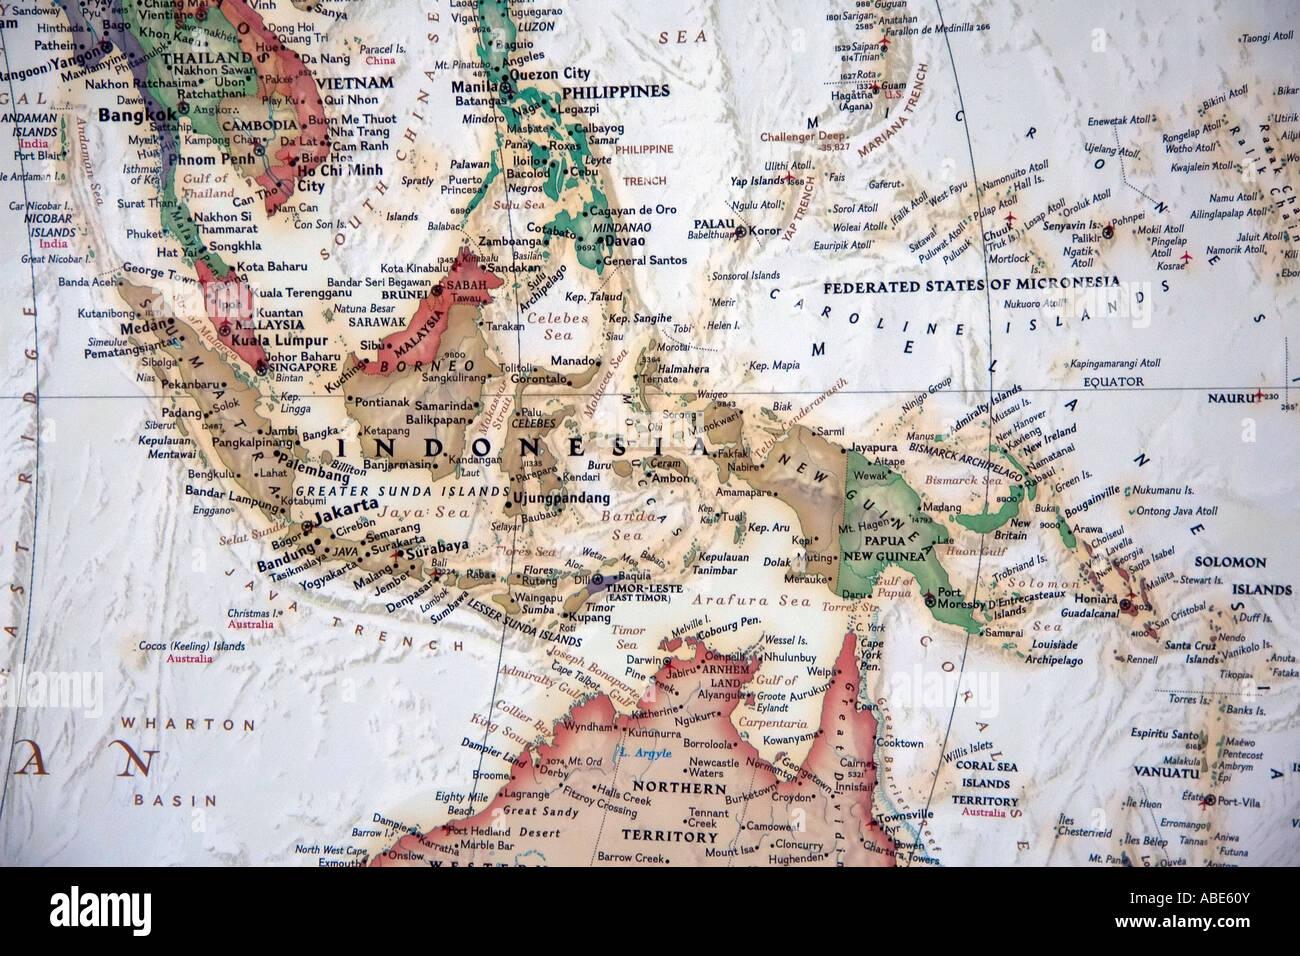 Cartina Indonesia Dettagliata.Carta Geografica Indonesia Immagini E Fotos Stock Alamy